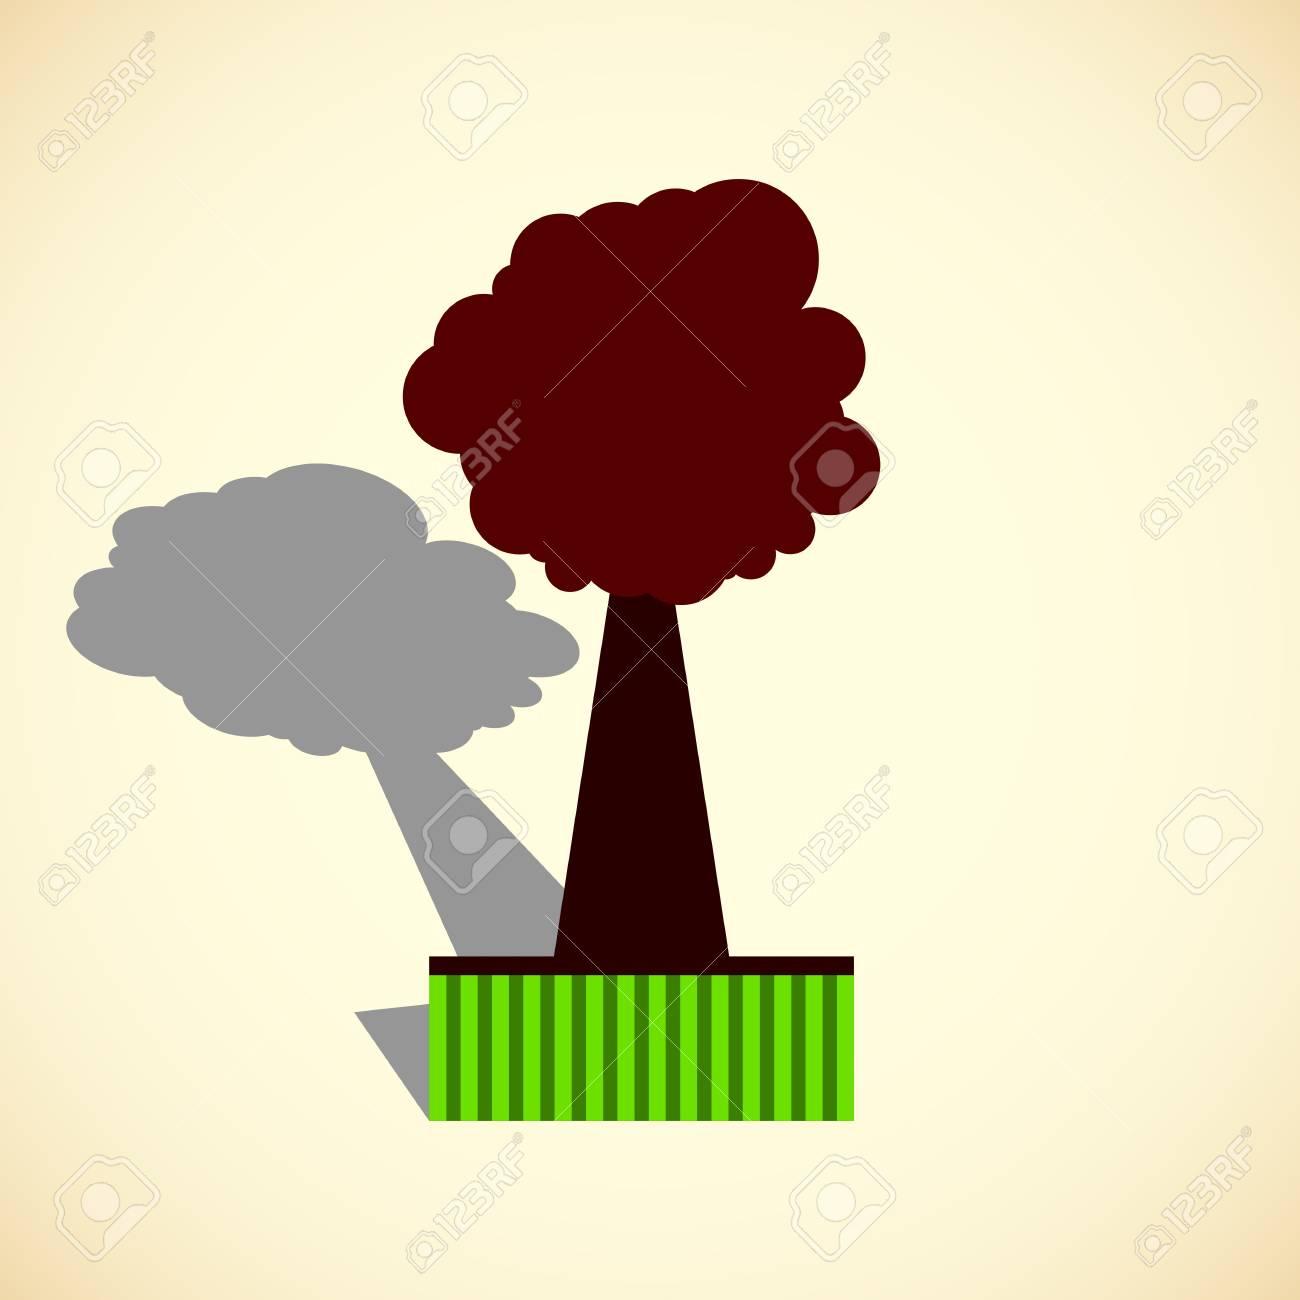 abstract tree illustration Stock Vector - 14165951